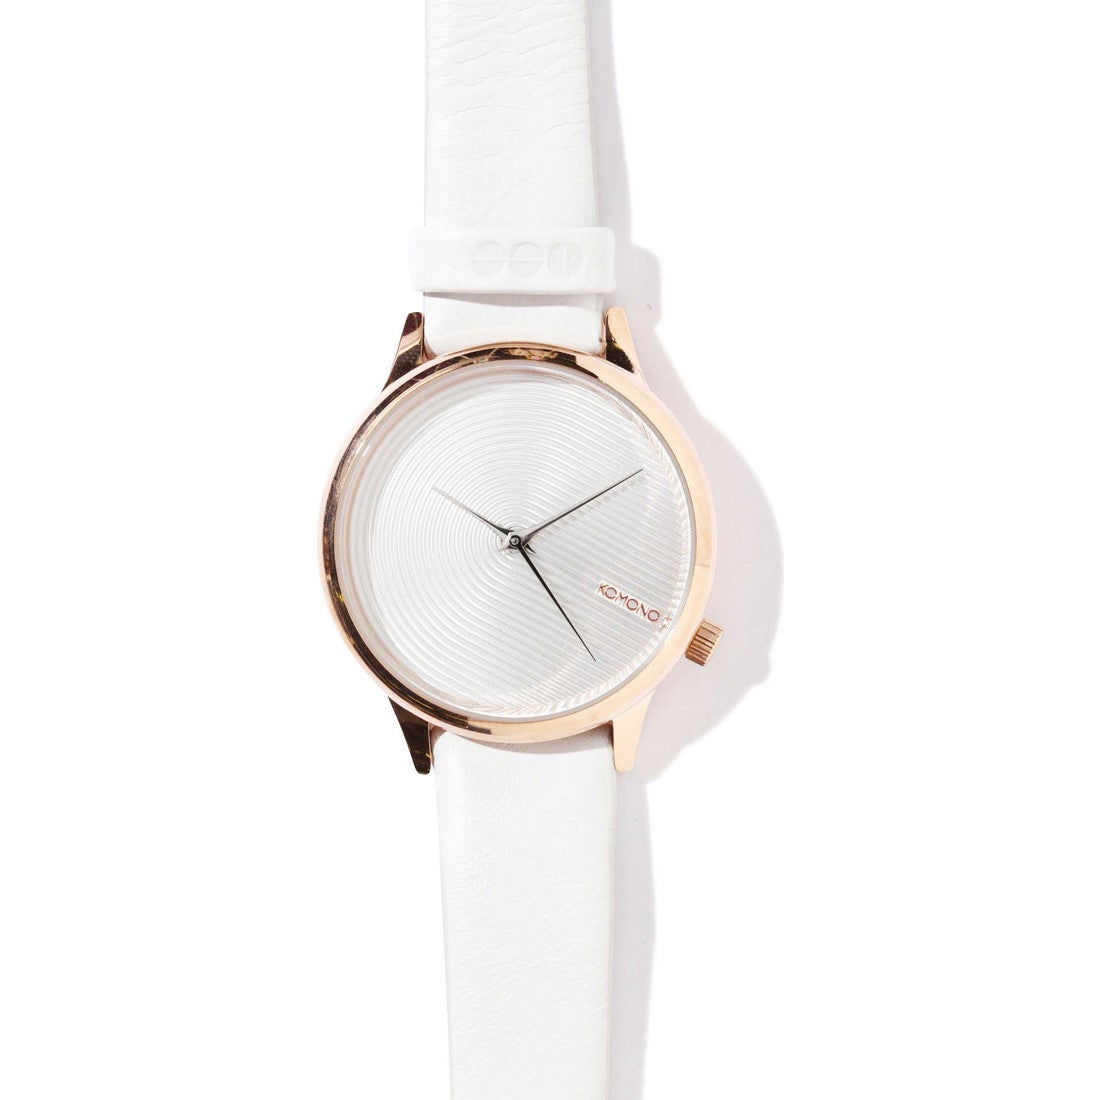 KOMONO腕時計OFFWHITE